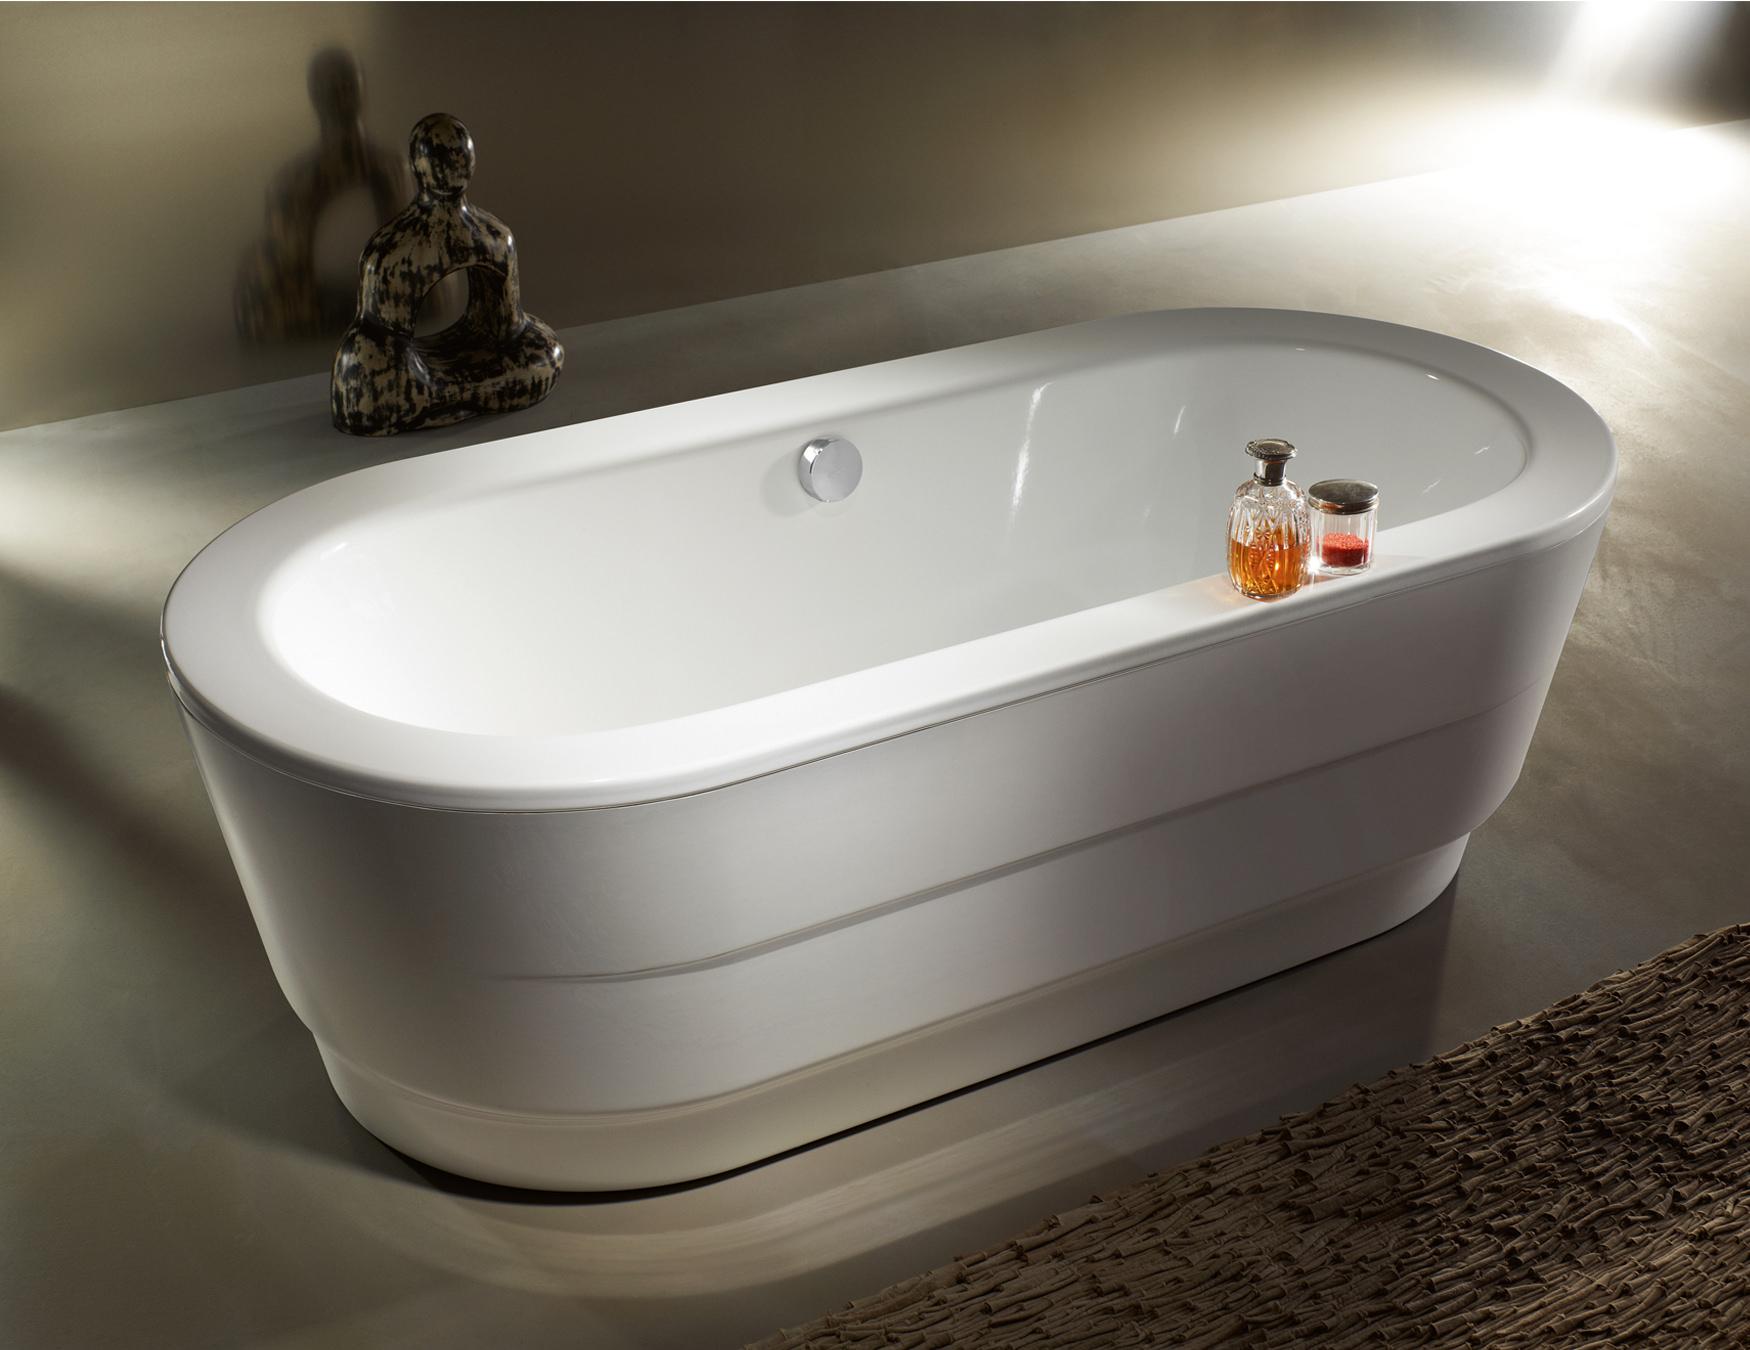 Kaldewei Classic Duo Oval Wide 115 7 Freestanding Steel Bath